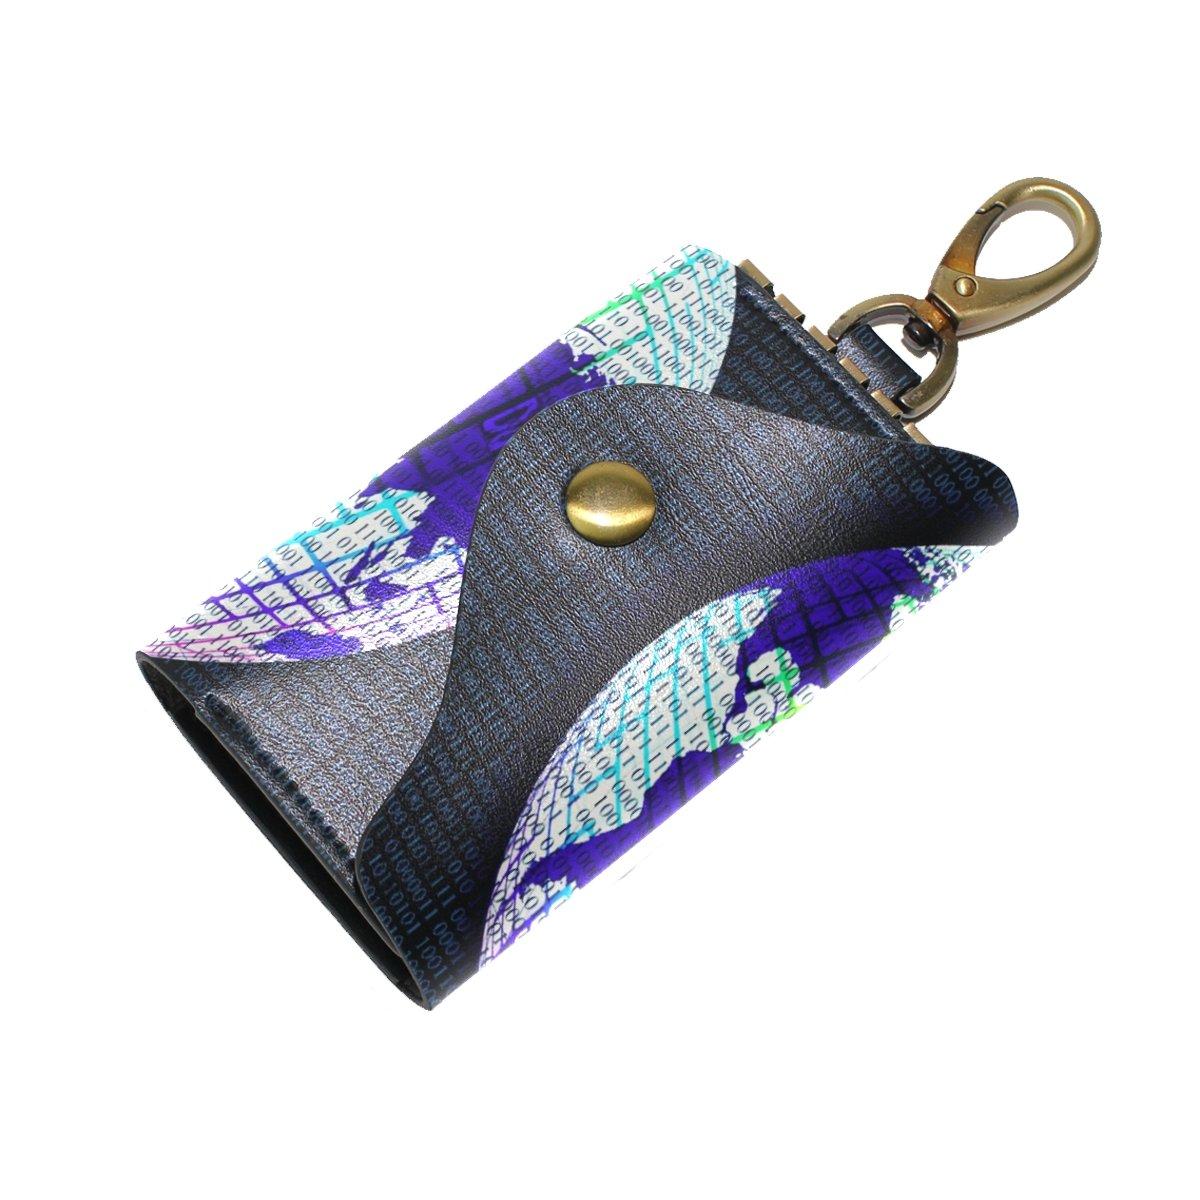 DEYYA Computer Number Leather Key Case Wallets Unisex Keychain Key Holder with 6 Hooks Snap Closure